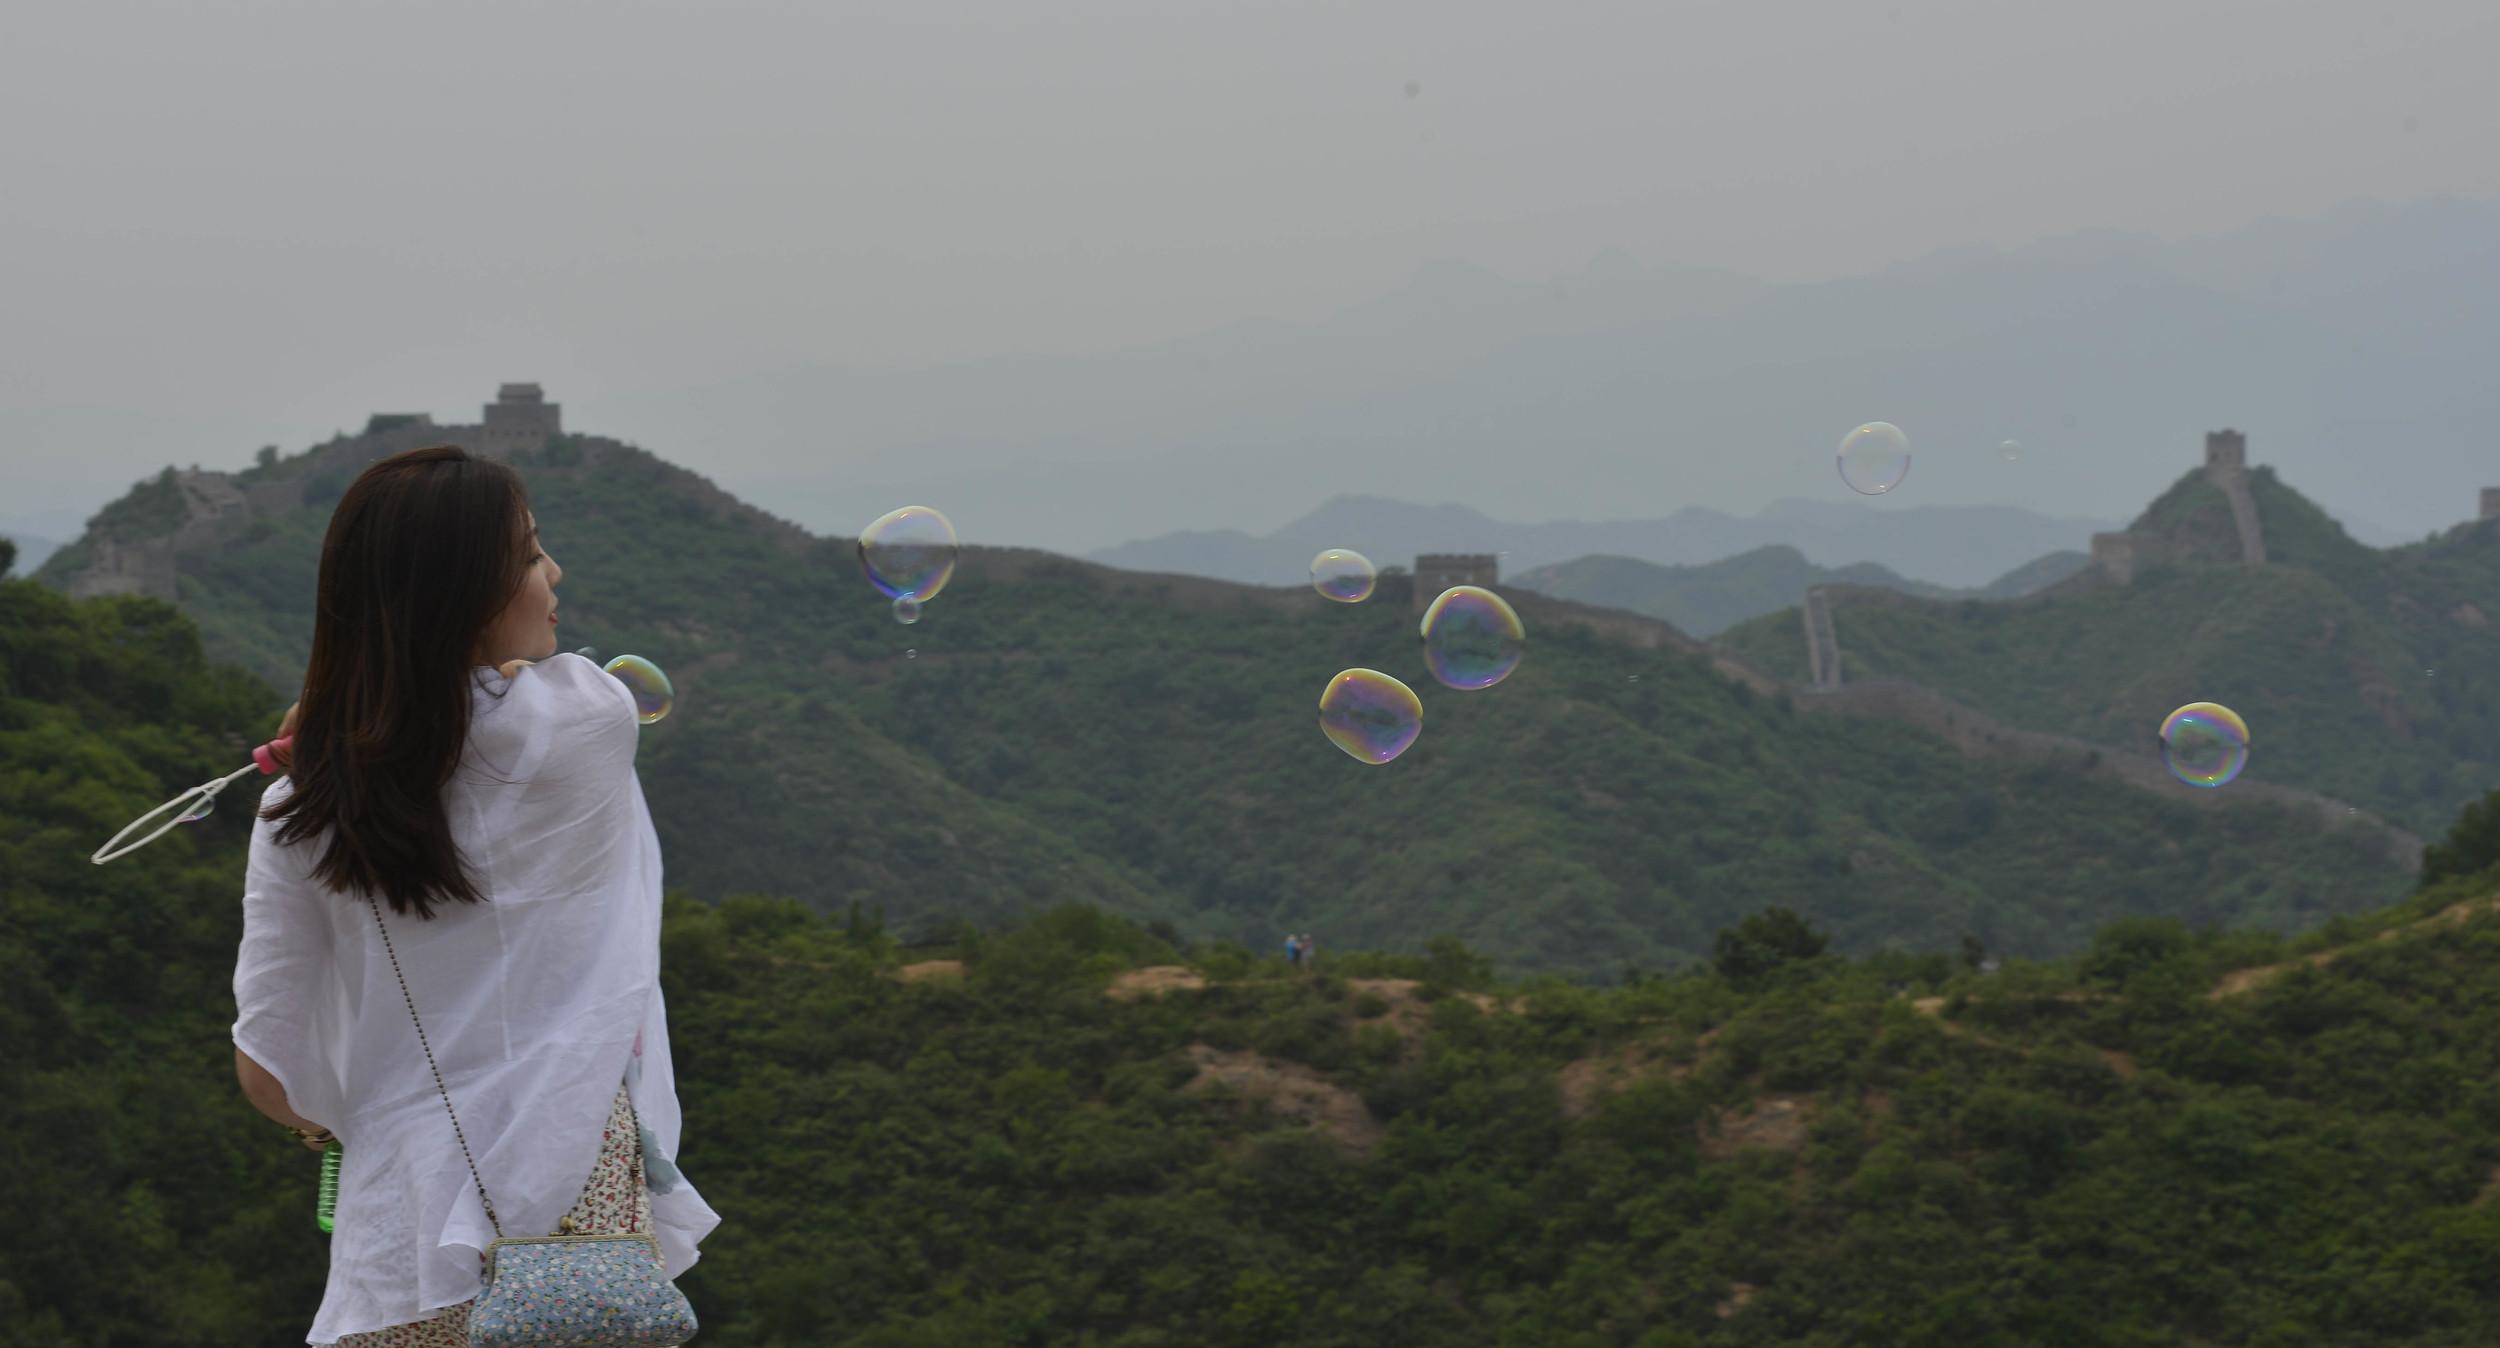 Beijing greatwall jinshanling bubble.JPG